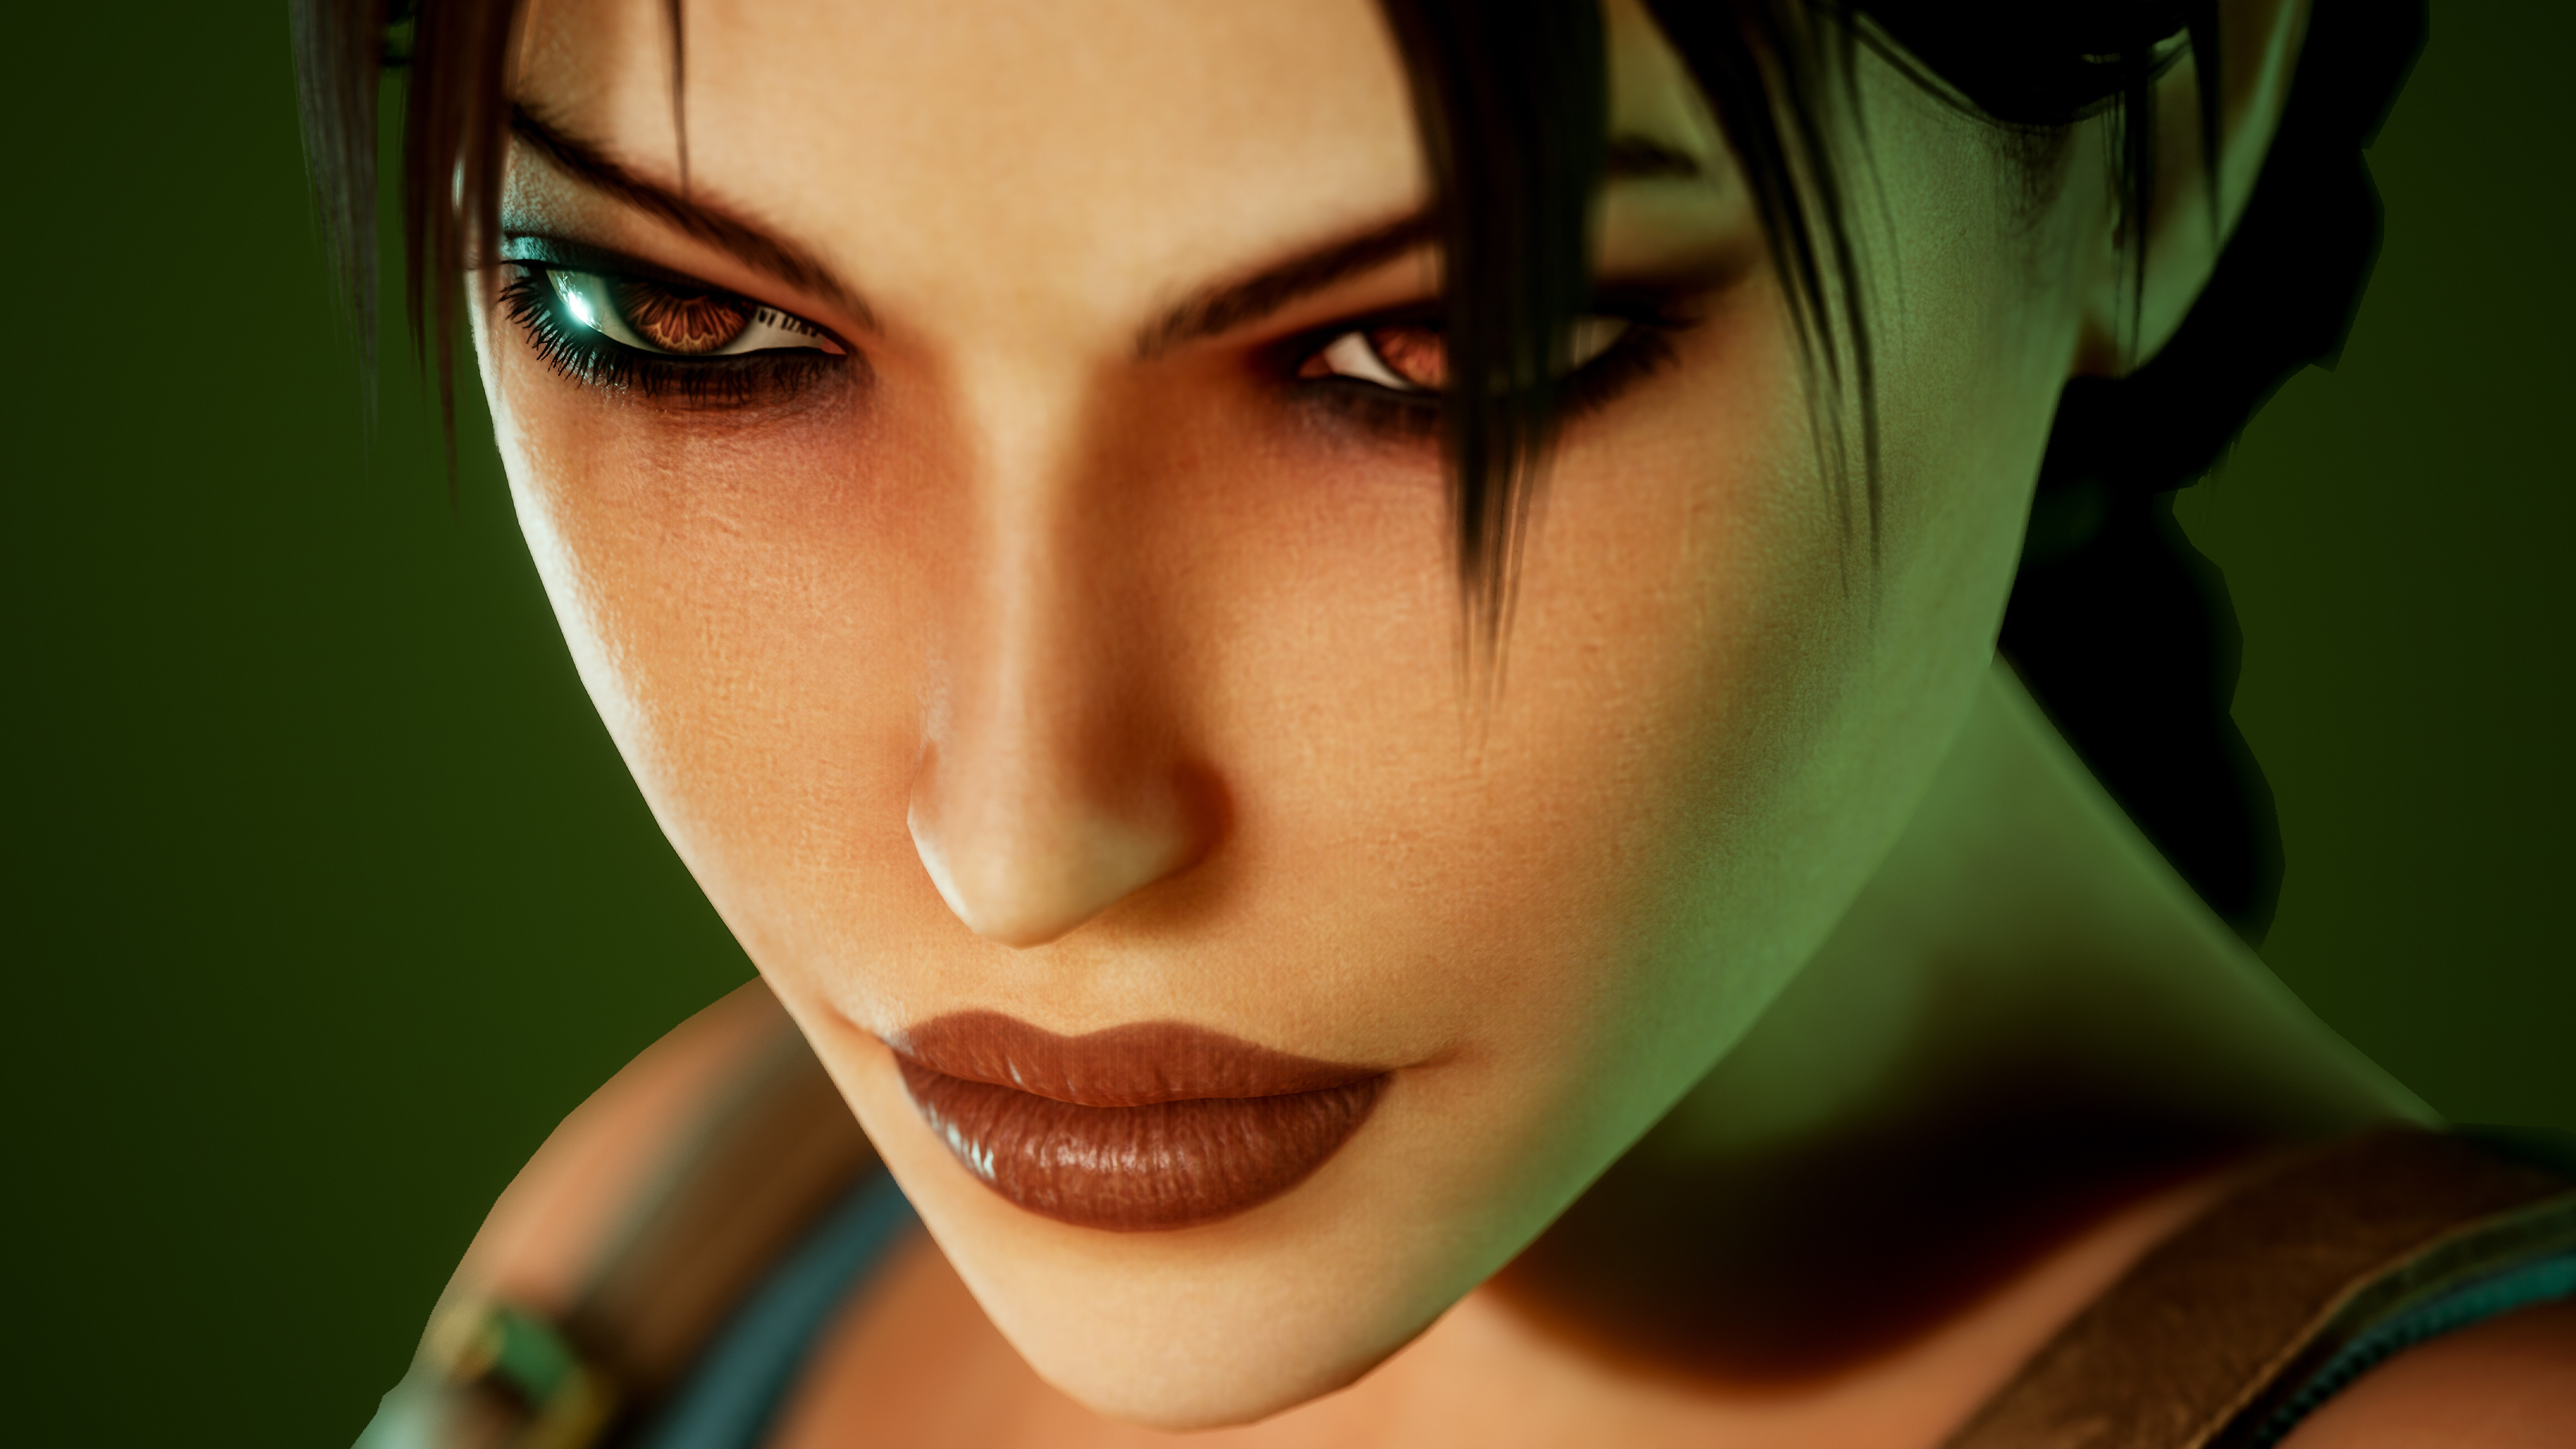 720x1280 4k Lara Croft Moto G,X Xperia Z1,Z3 Compact